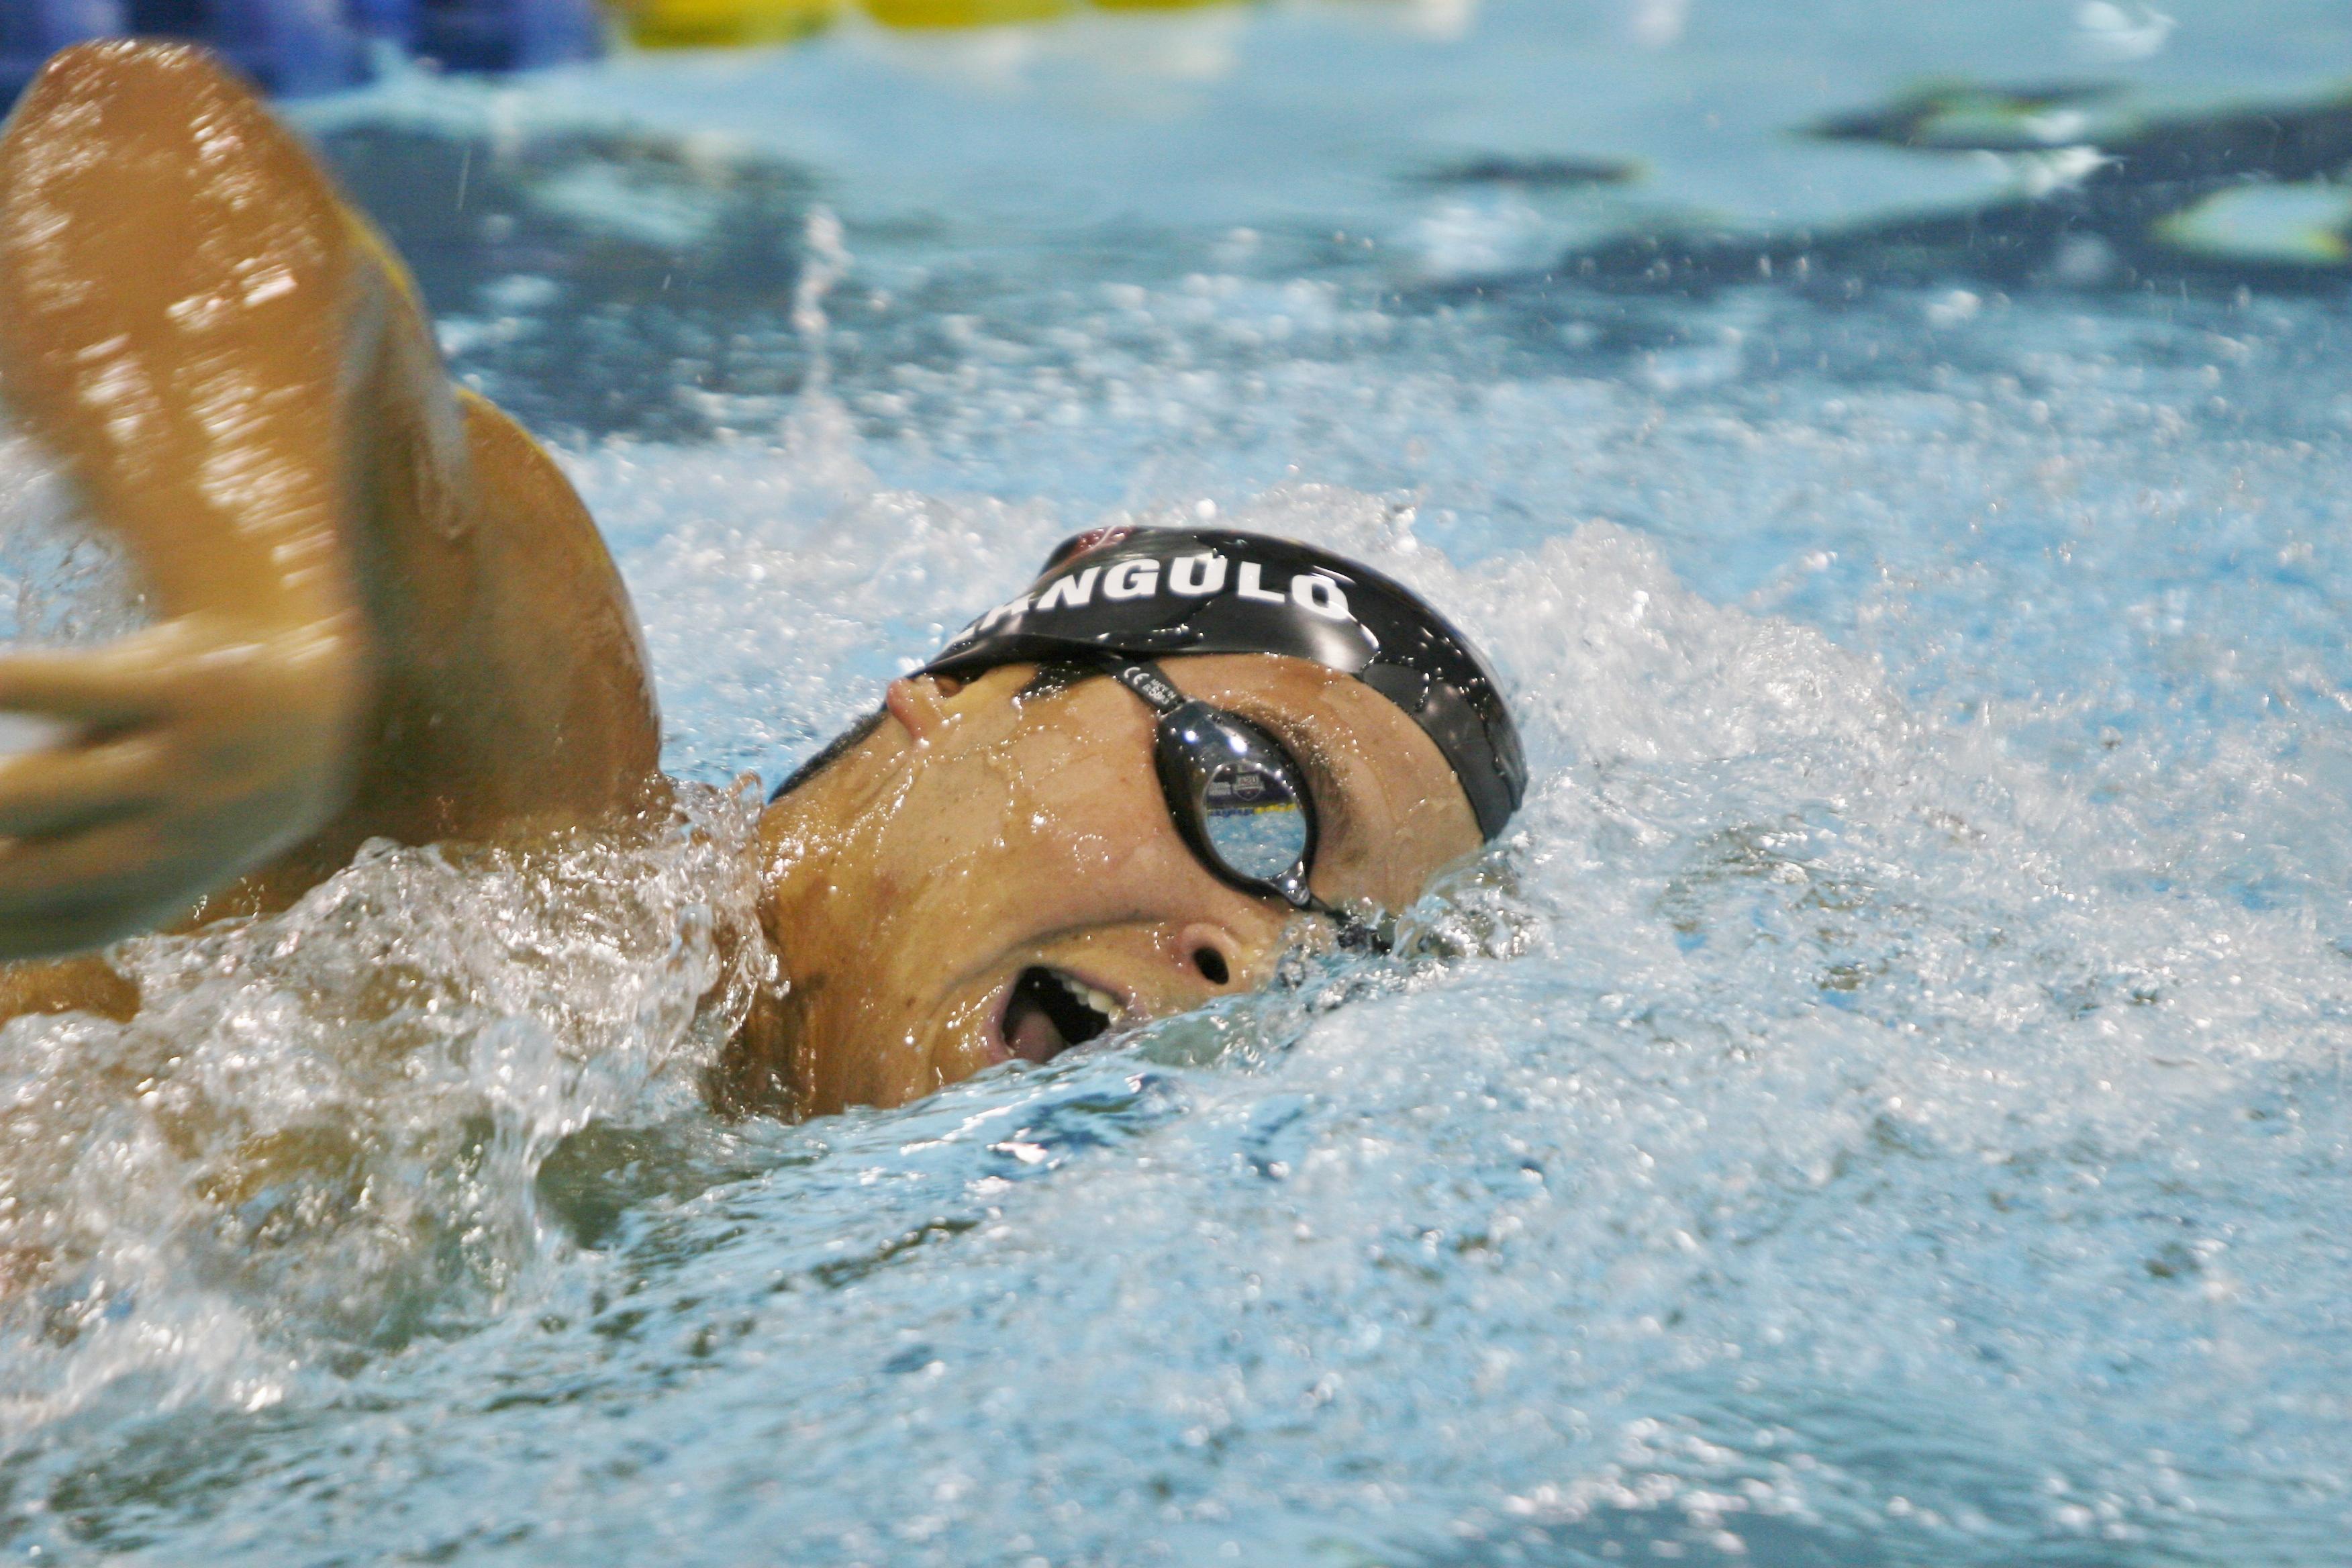 UltraSwim Olympic Trials